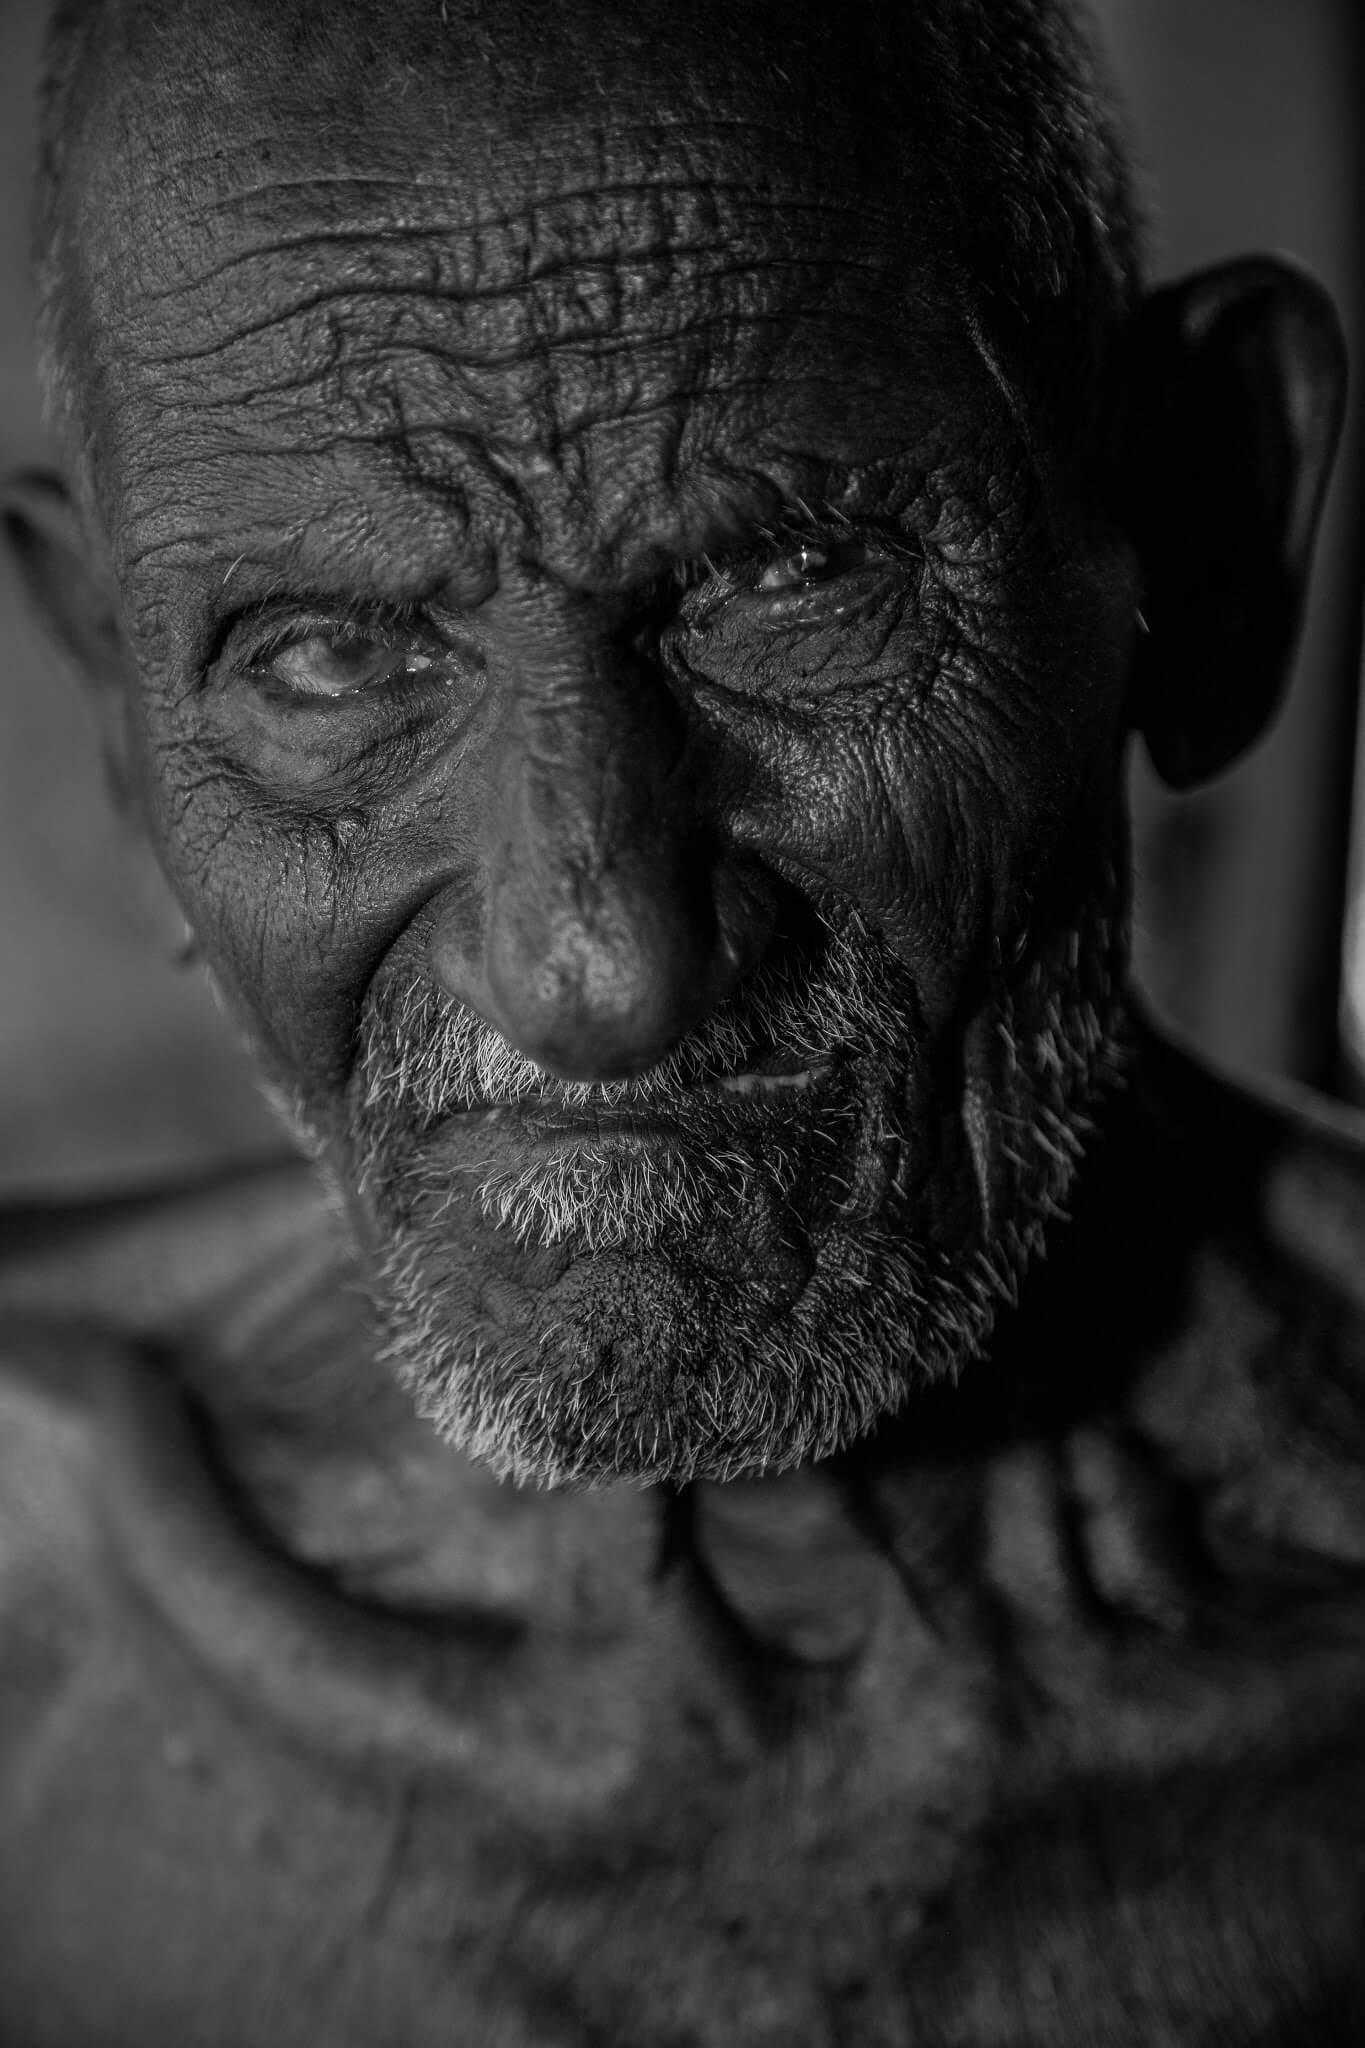 old man portrait BW